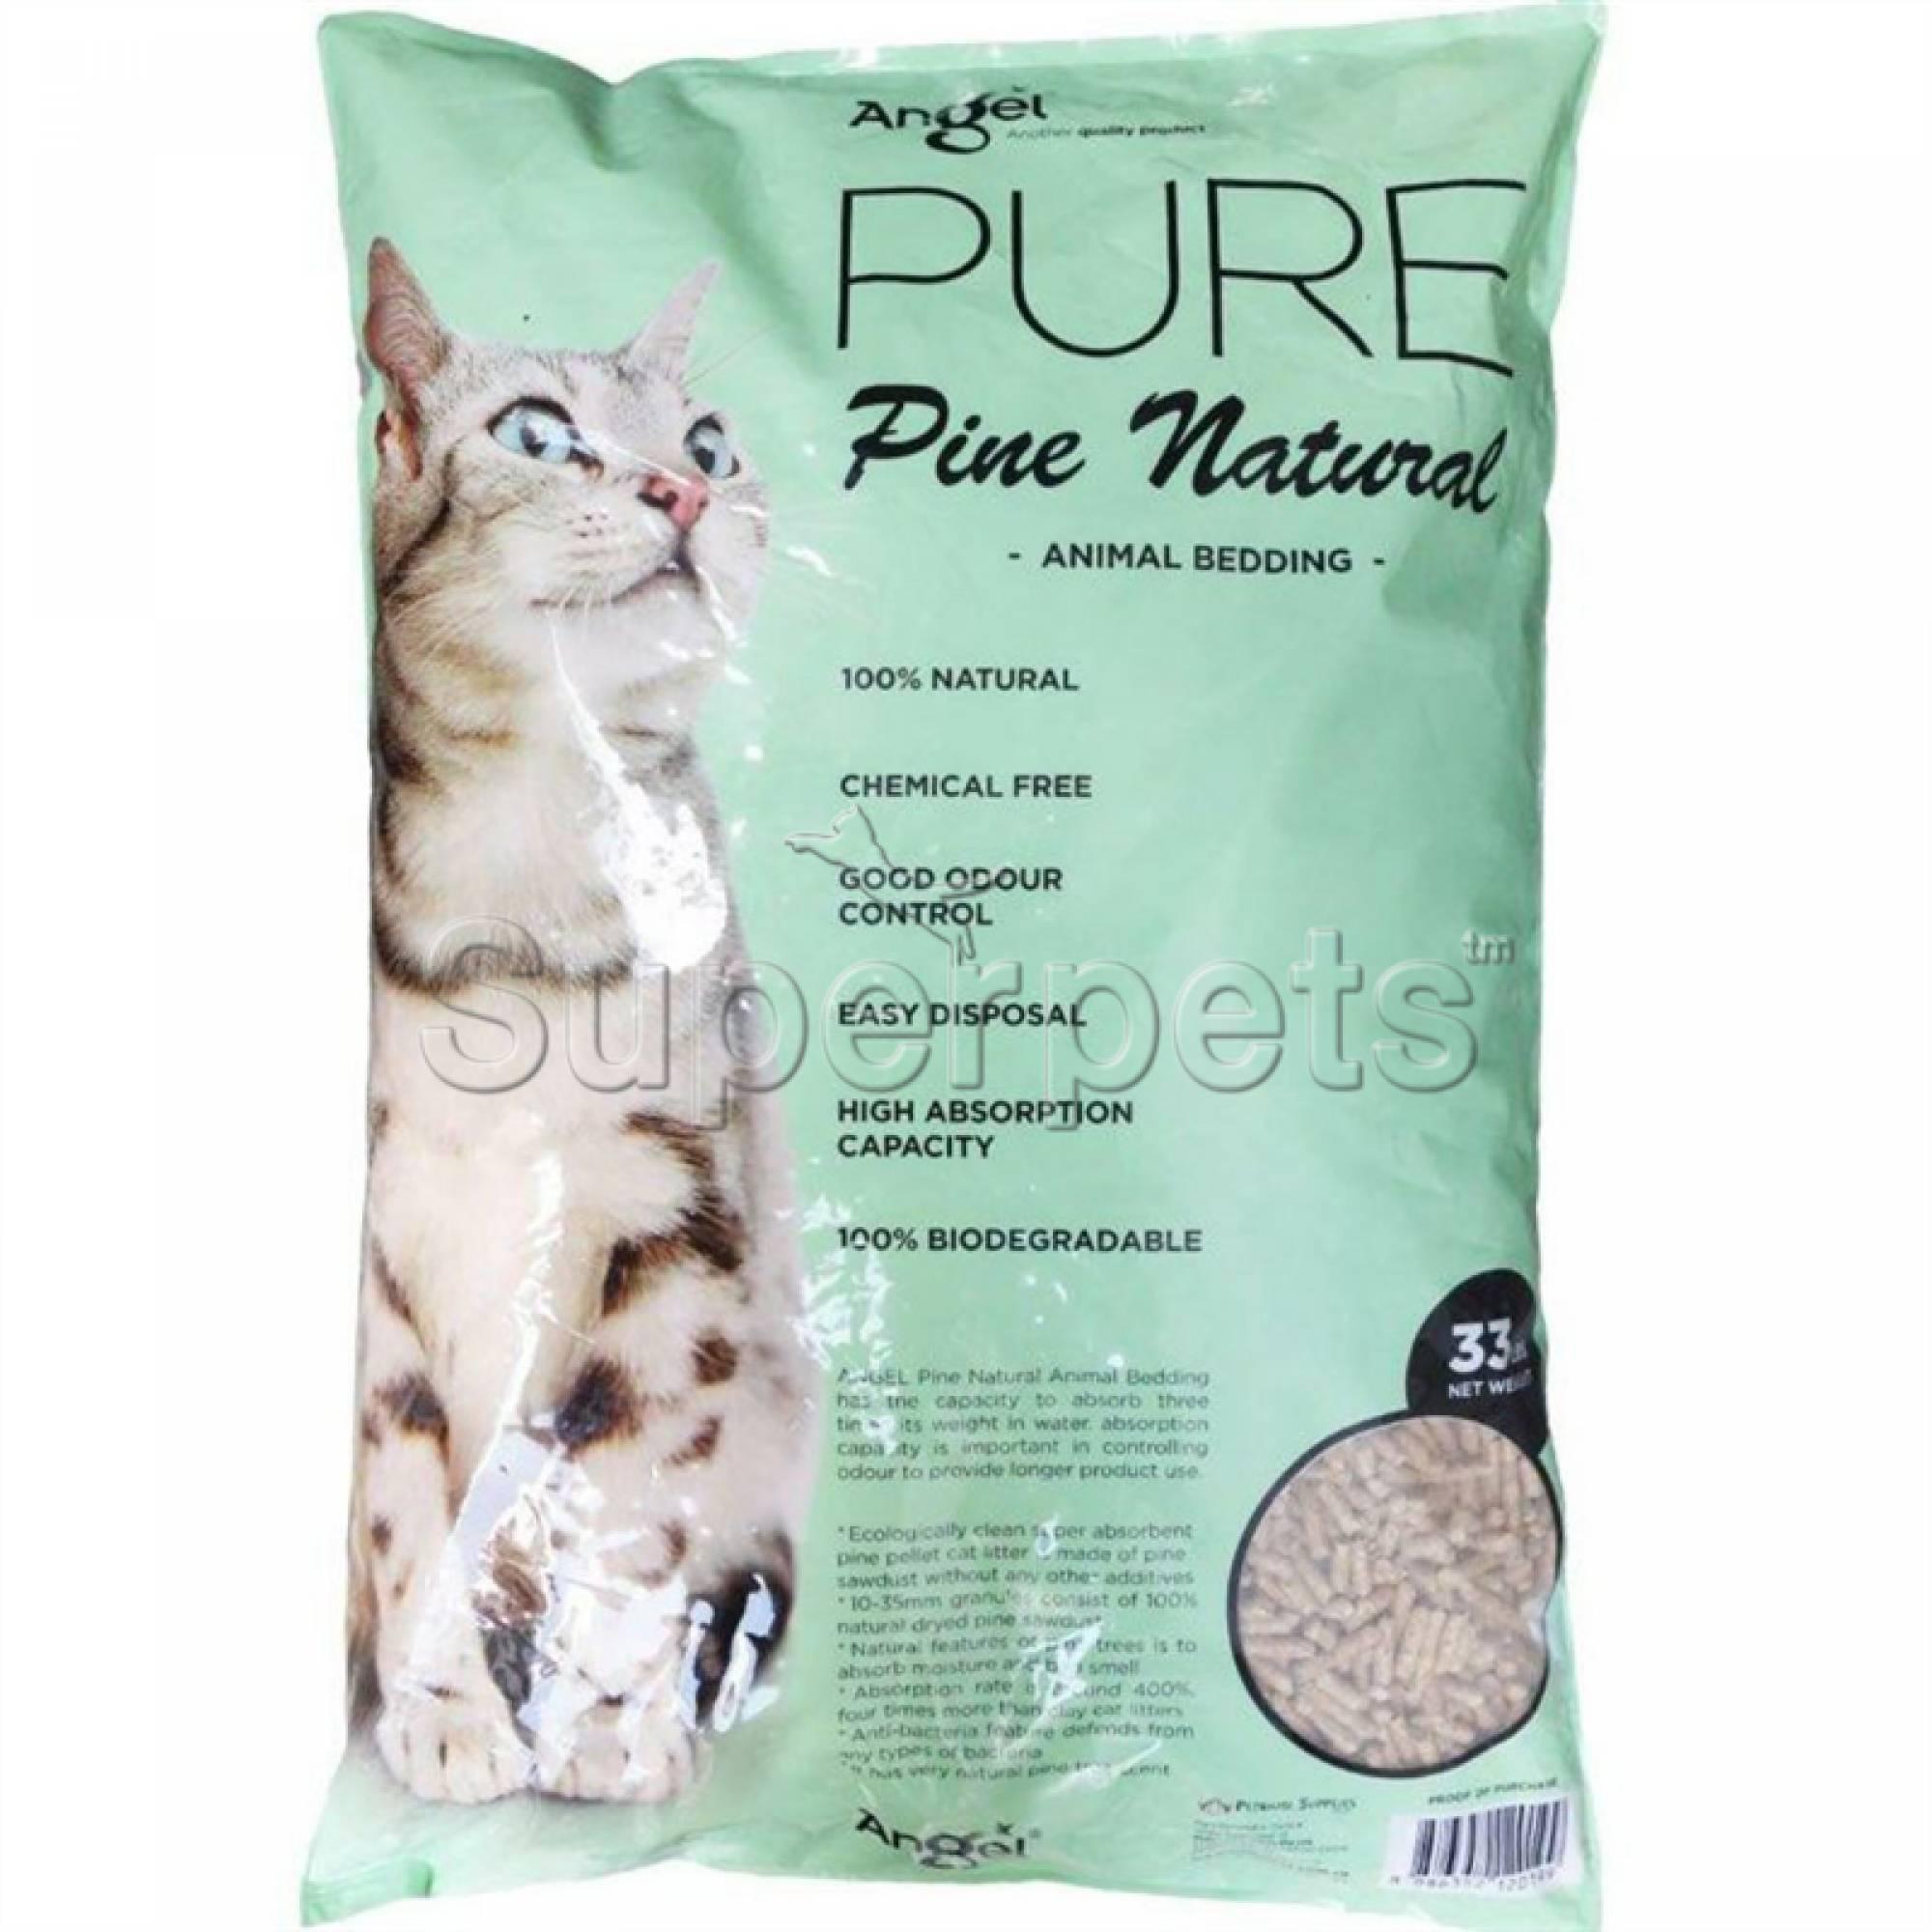 Angel - Pine Natural Cat Litter 33lb (15kg)